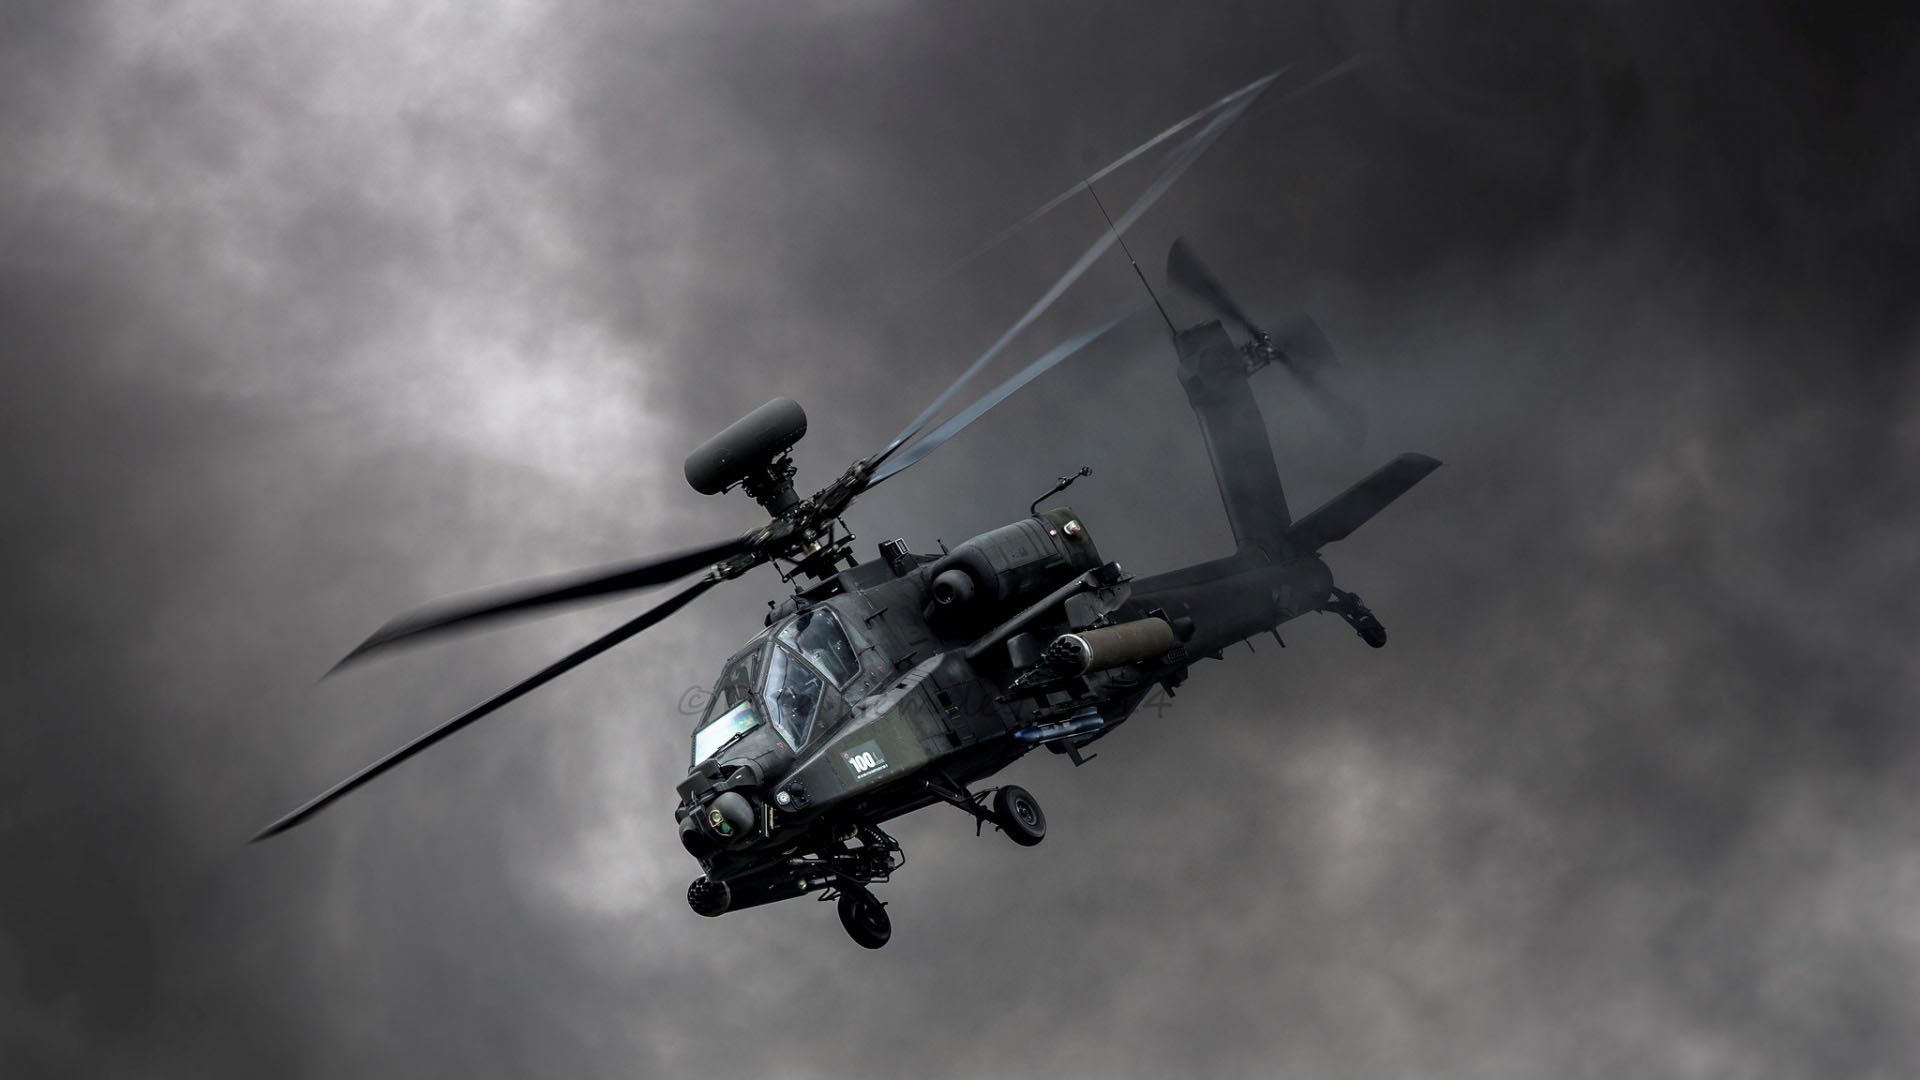 Apache Helicopter Wallpaper Desktop: 1920x1080px Apache Longbow Wallpaper